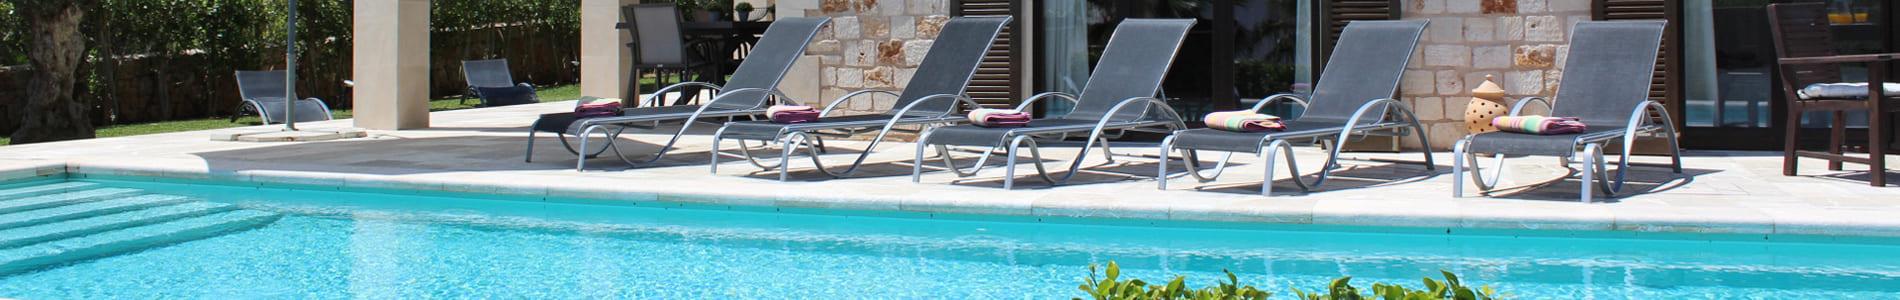 Fotogalerie Ferienhaus Cala Llombards Mallorca